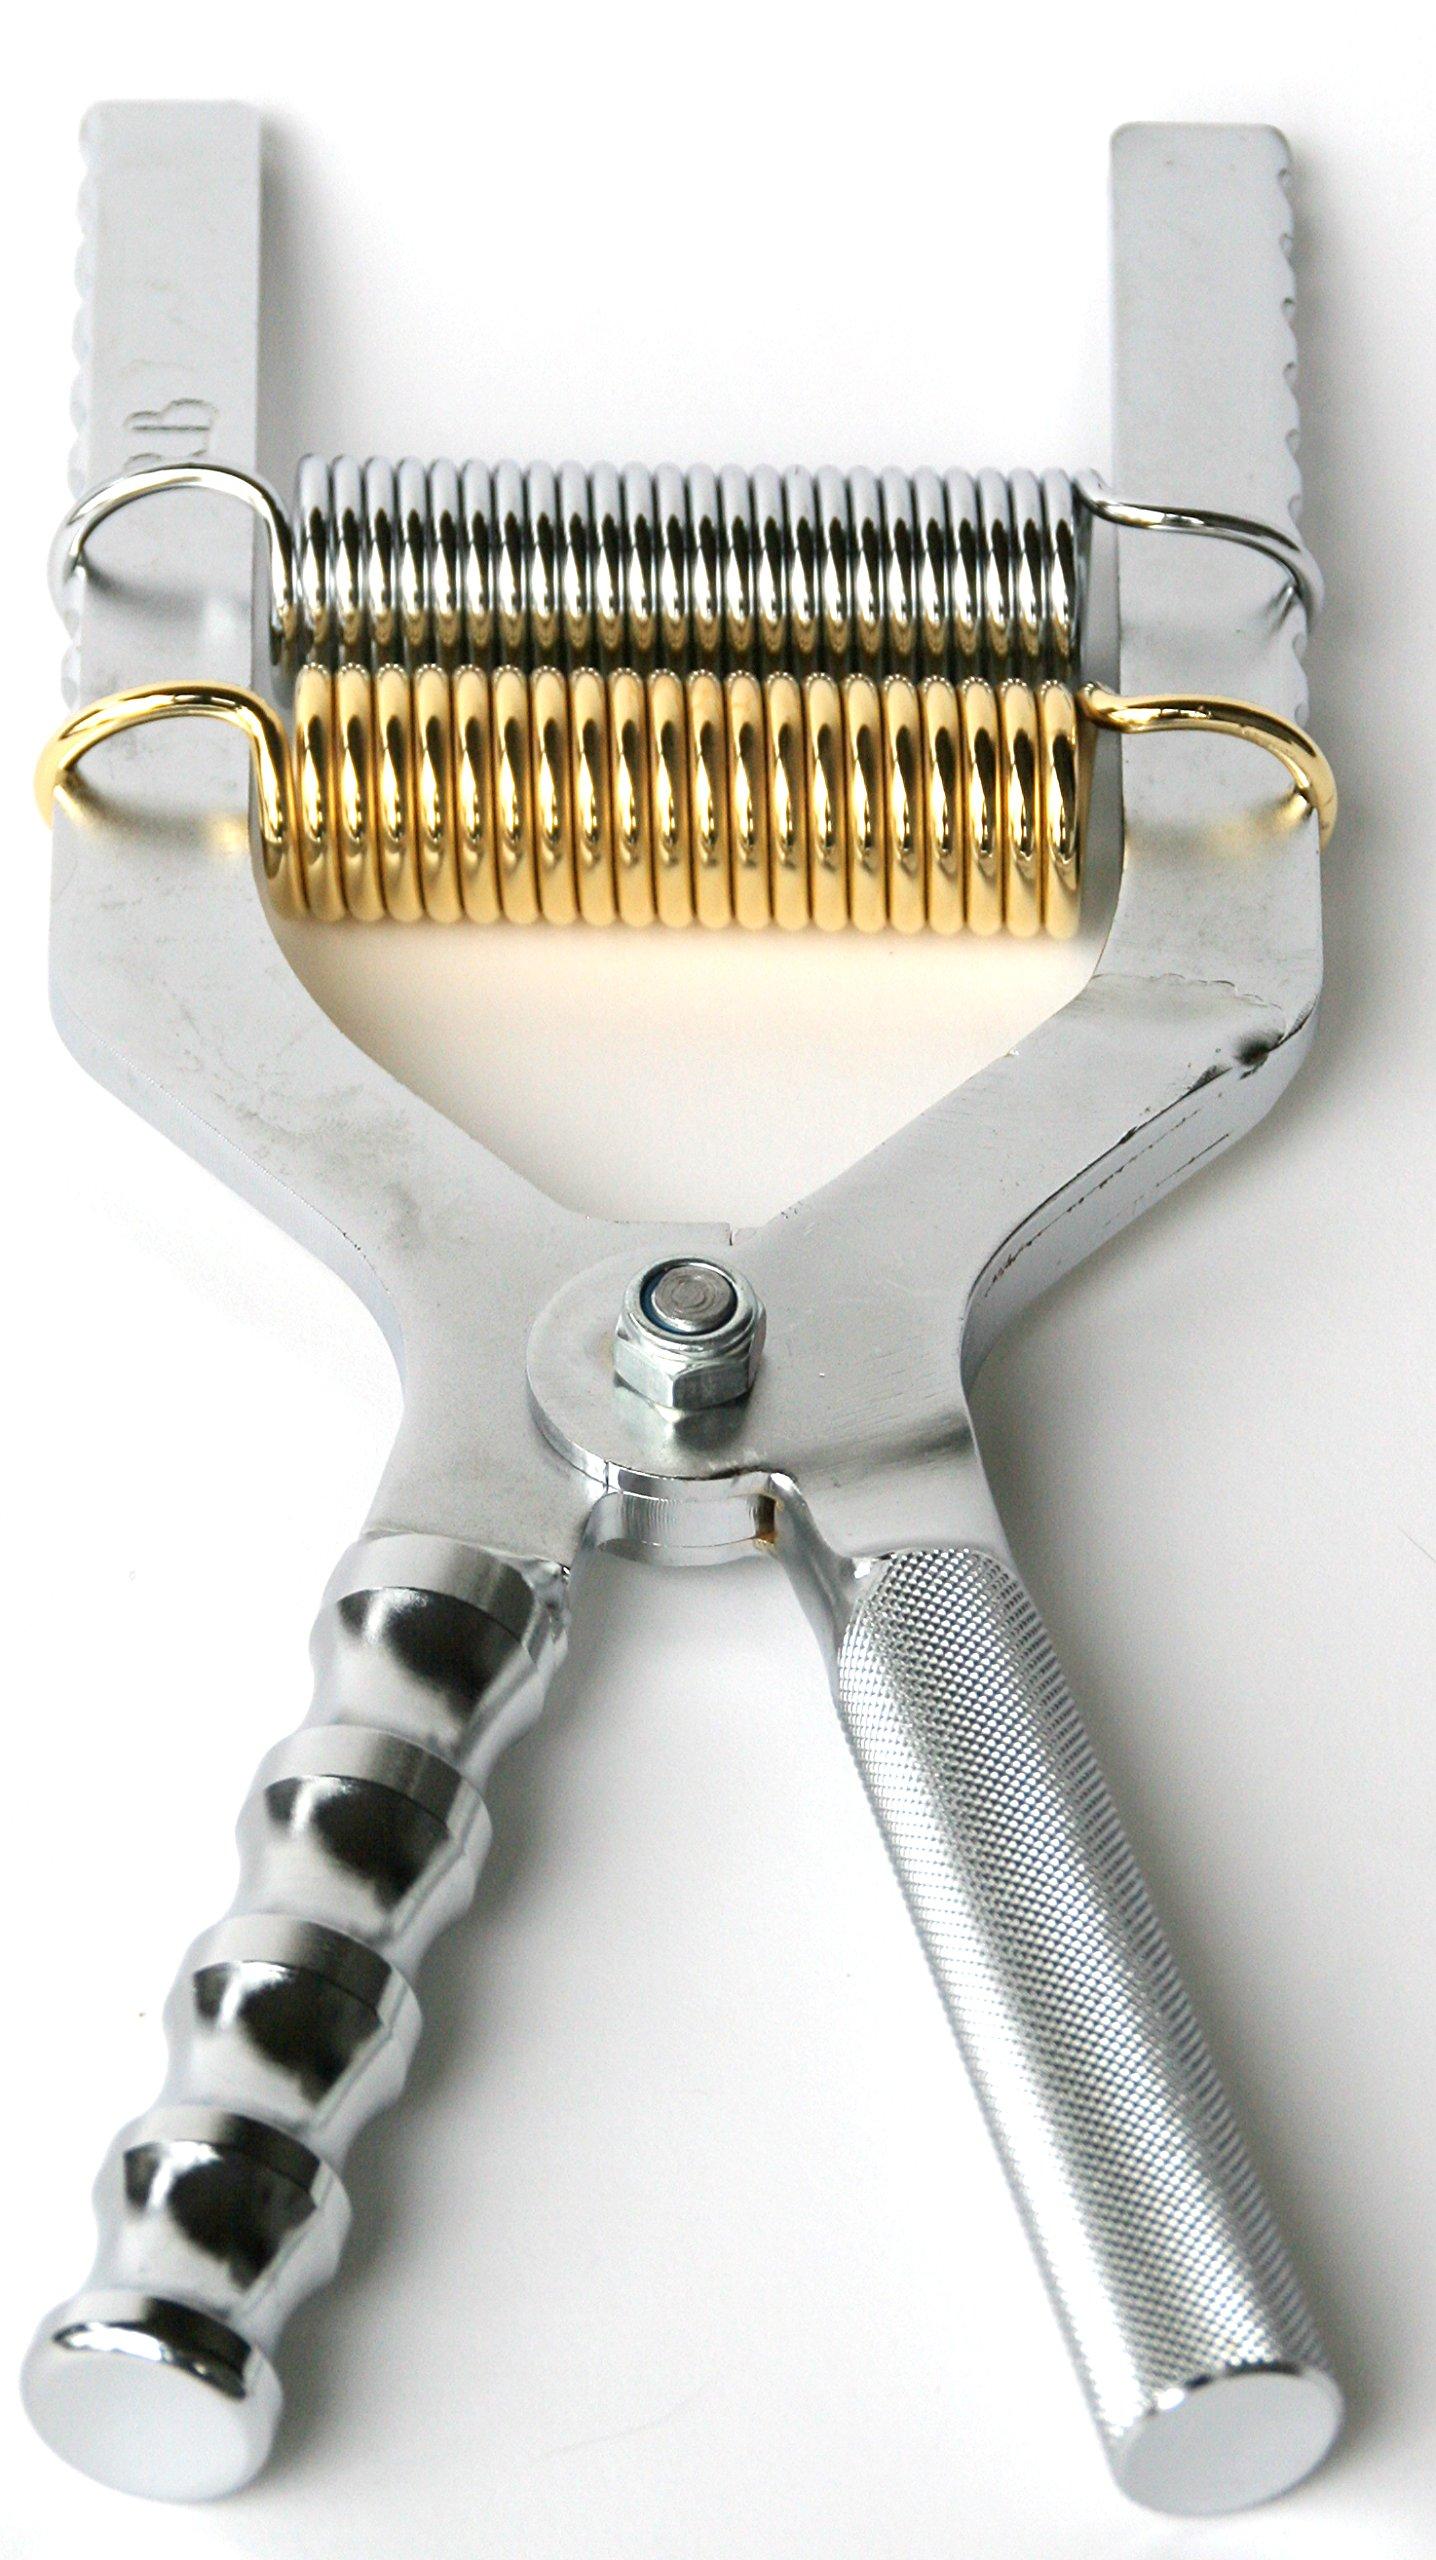 Robert Baraban Chrome Adjustable Hand Gripper 50/500lbs Resistance With Ergonomic Handle by Robert Baraban